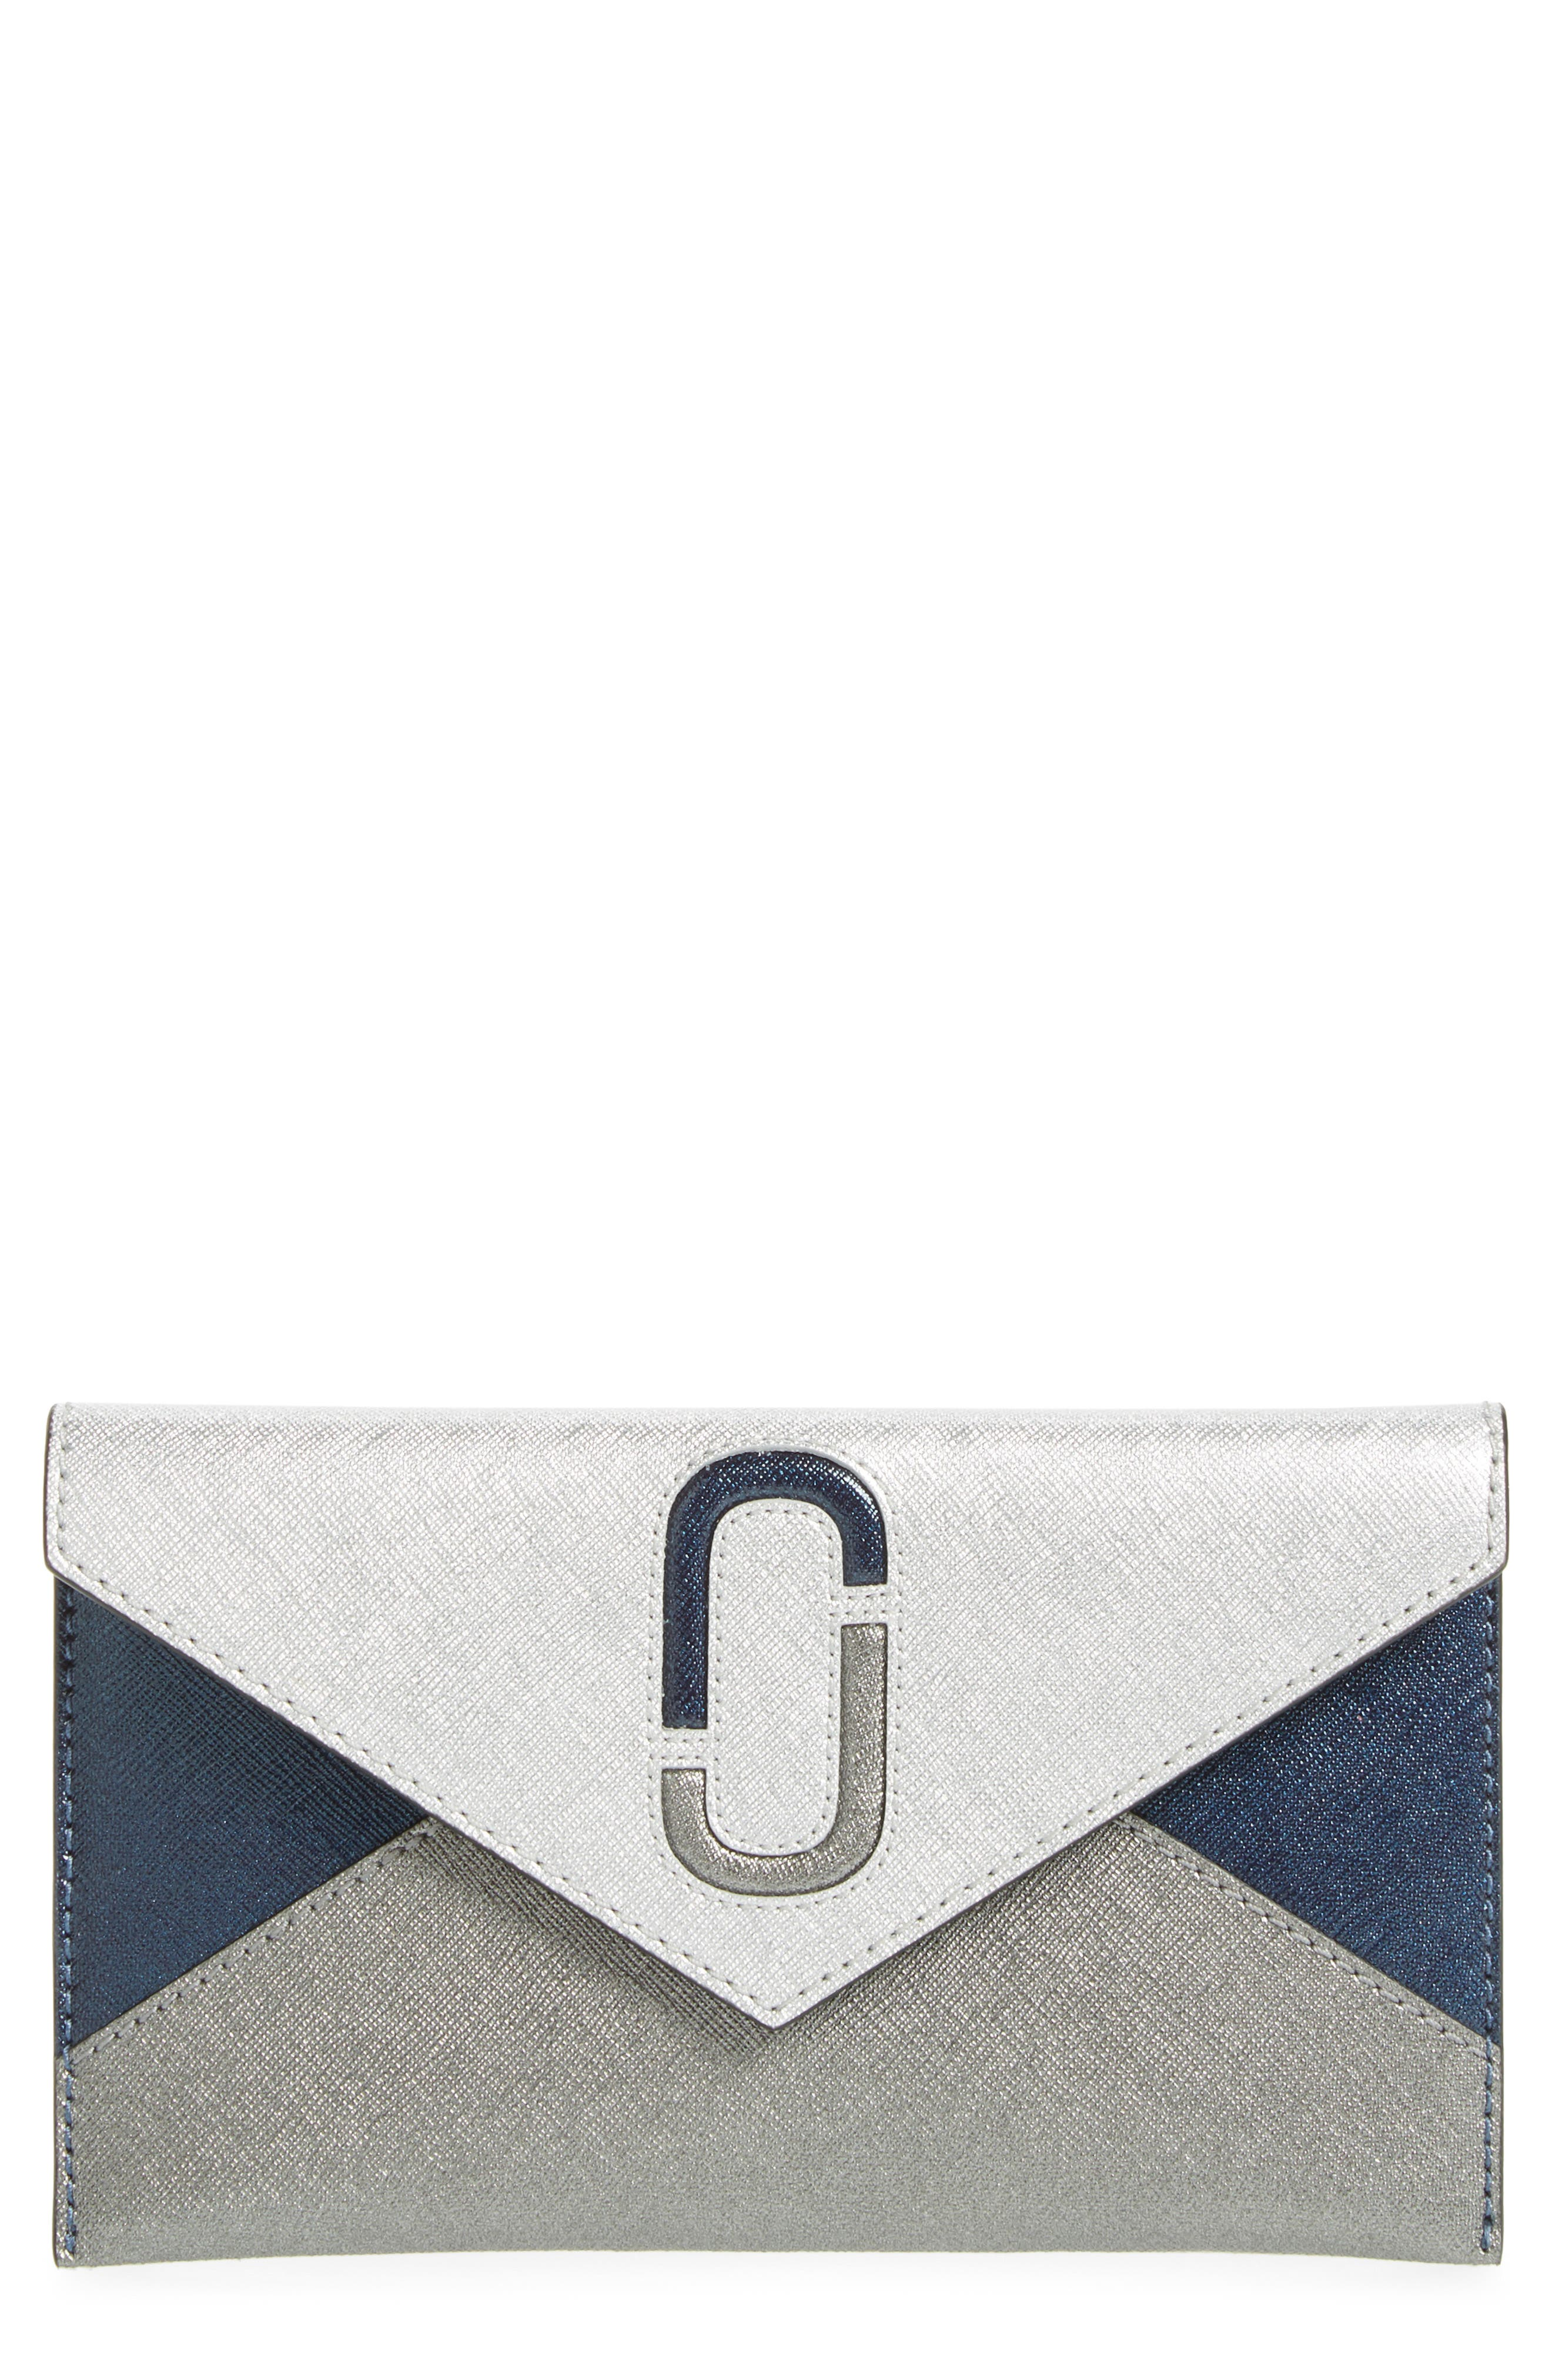 Double-J Saffiano Leather Pouch,                             Main thumbnail 1, color,                             Silver Multi